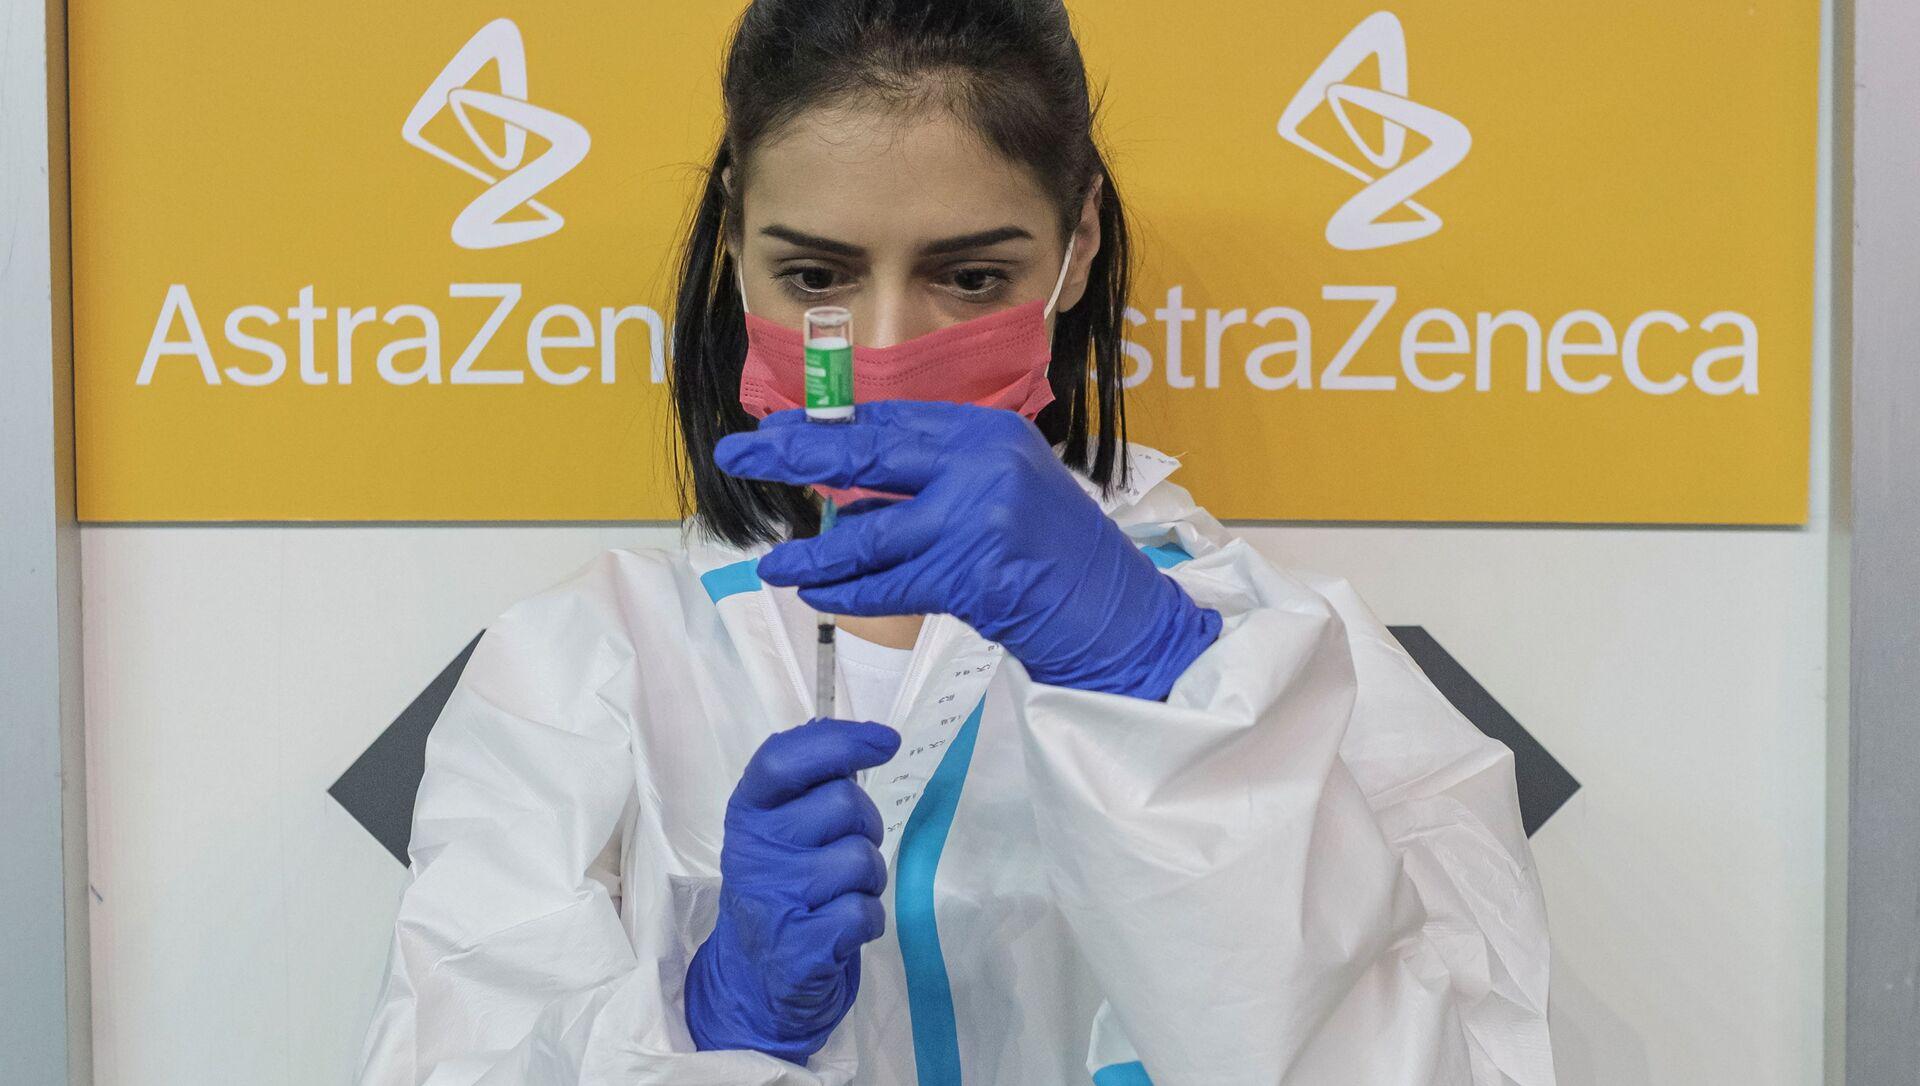 A nurse fills a syringe with a dose of the AstraZeneca vaccine against the coronavirus disease (COVID-19) - Sputnik 日本, 1920, 09.04.2021